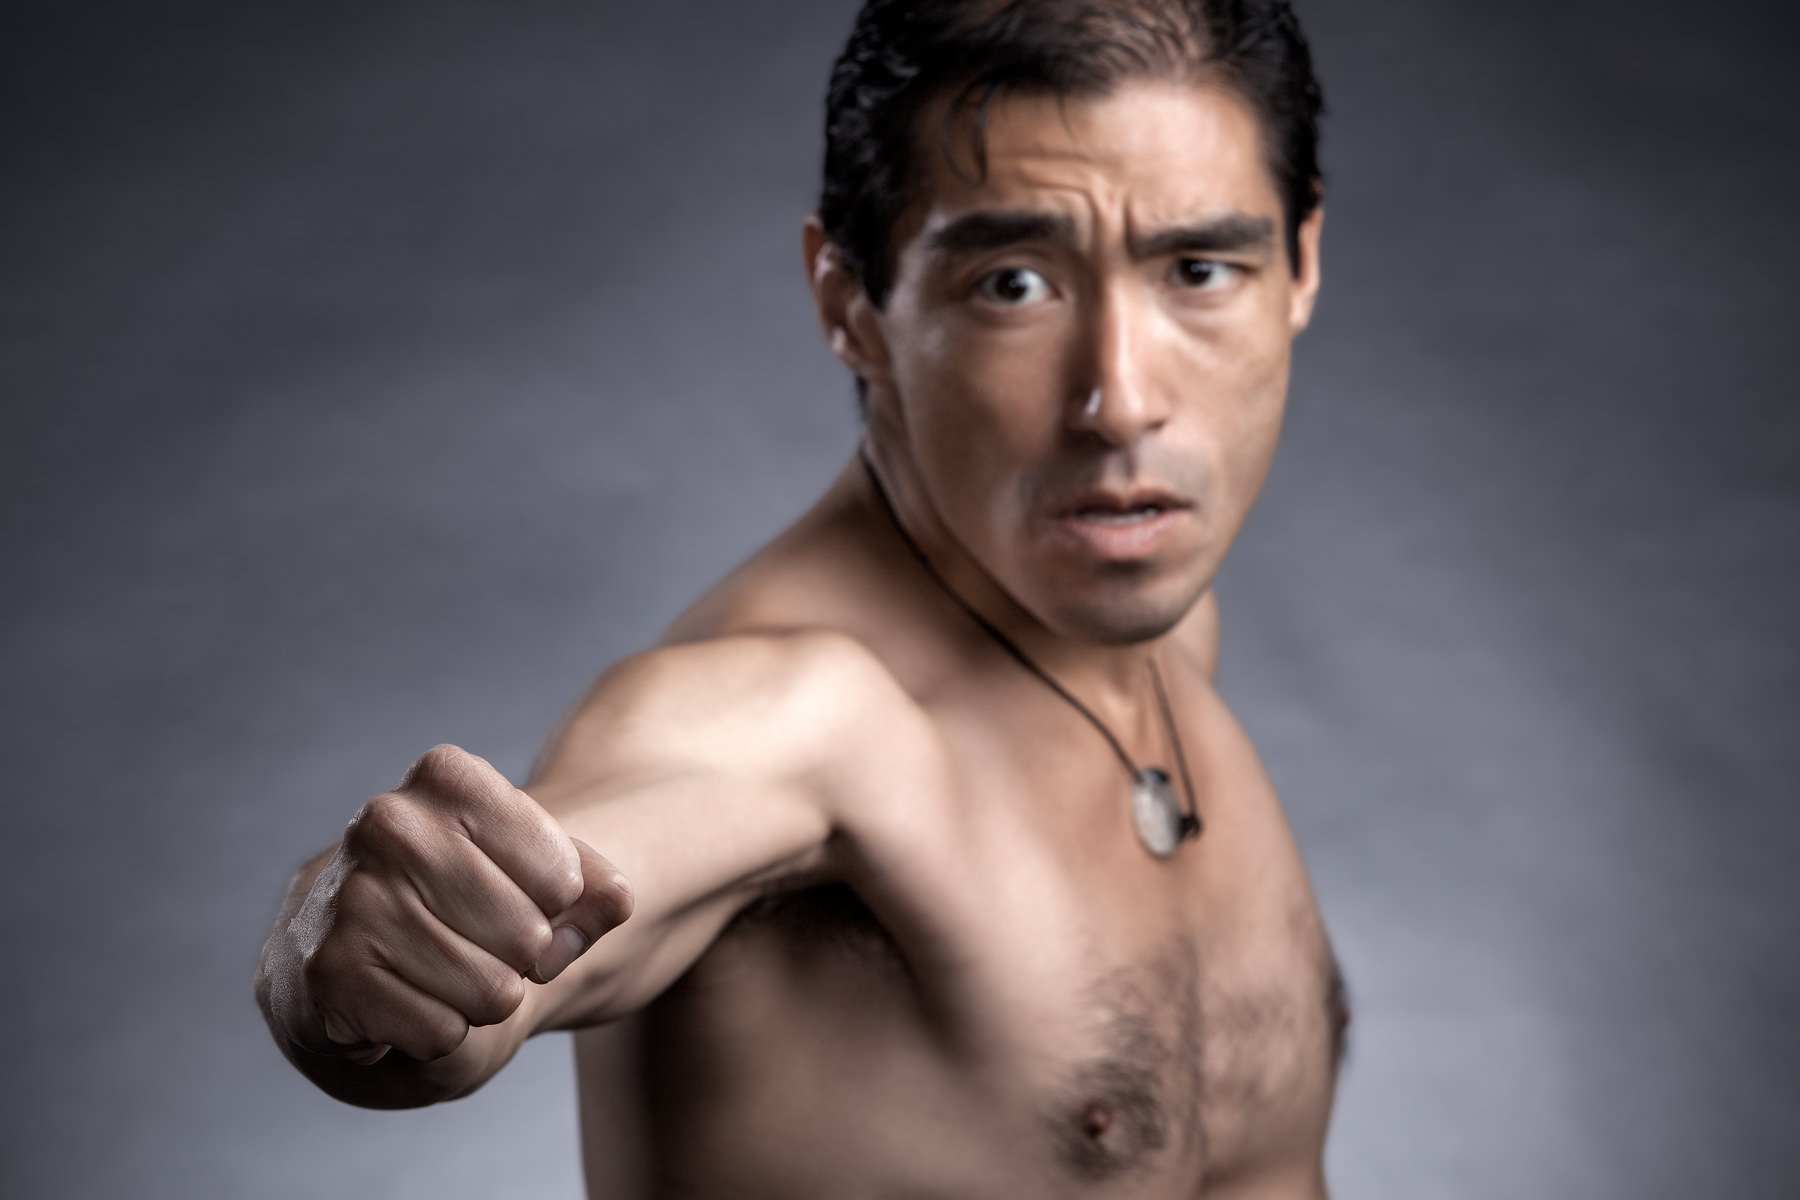 Bruce Lee punch